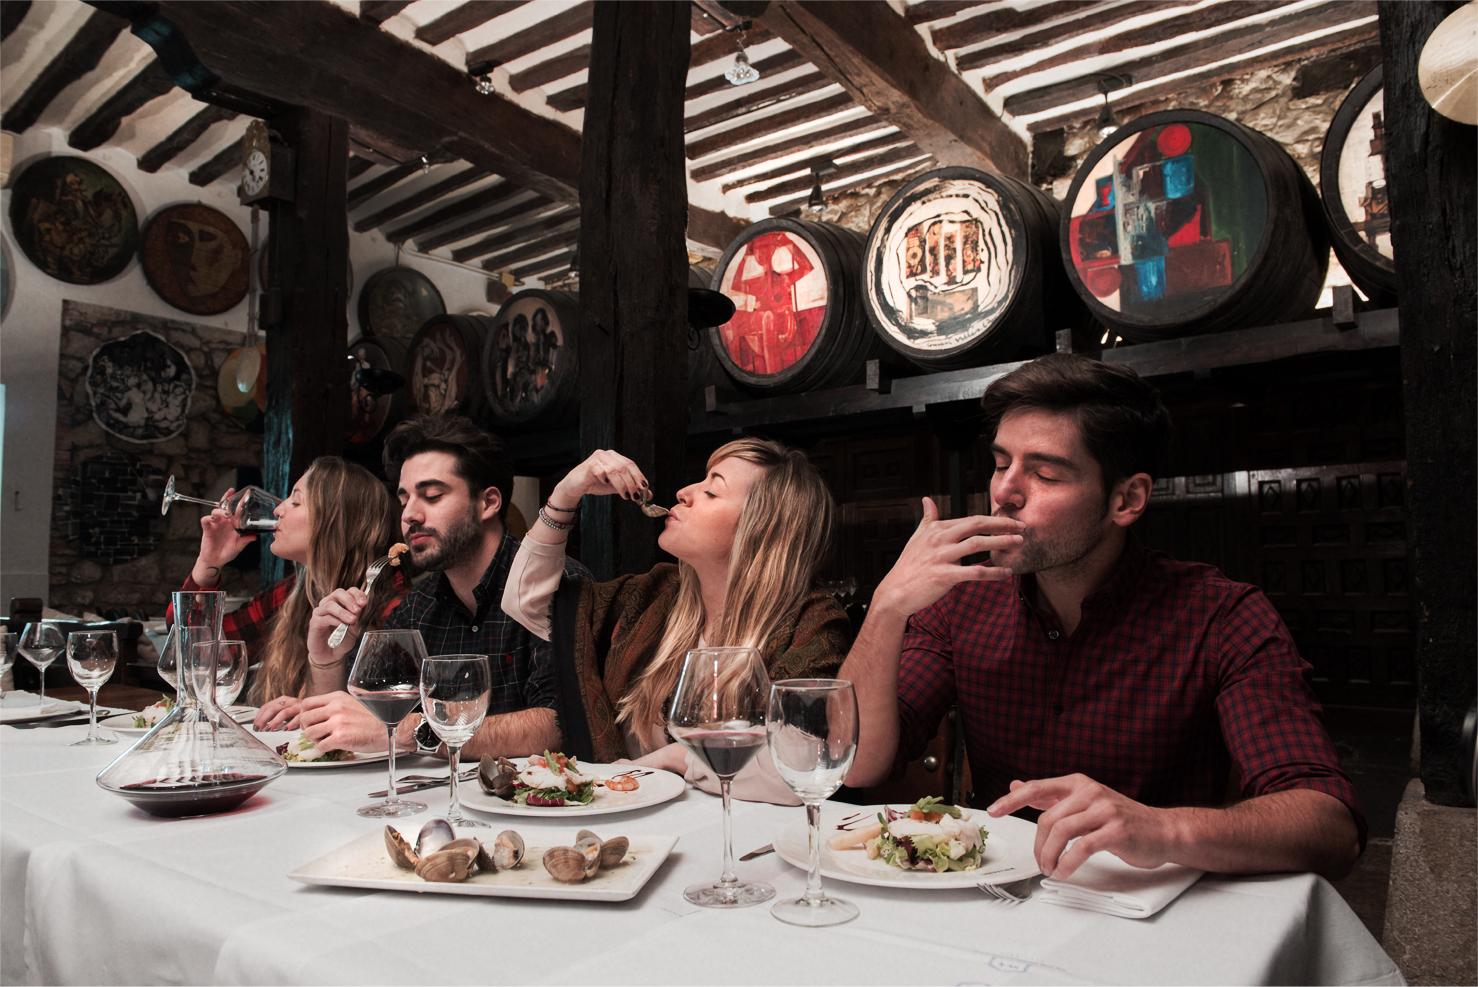 Gastronomia/Gastronomy :: Cantabria, Spain cover image